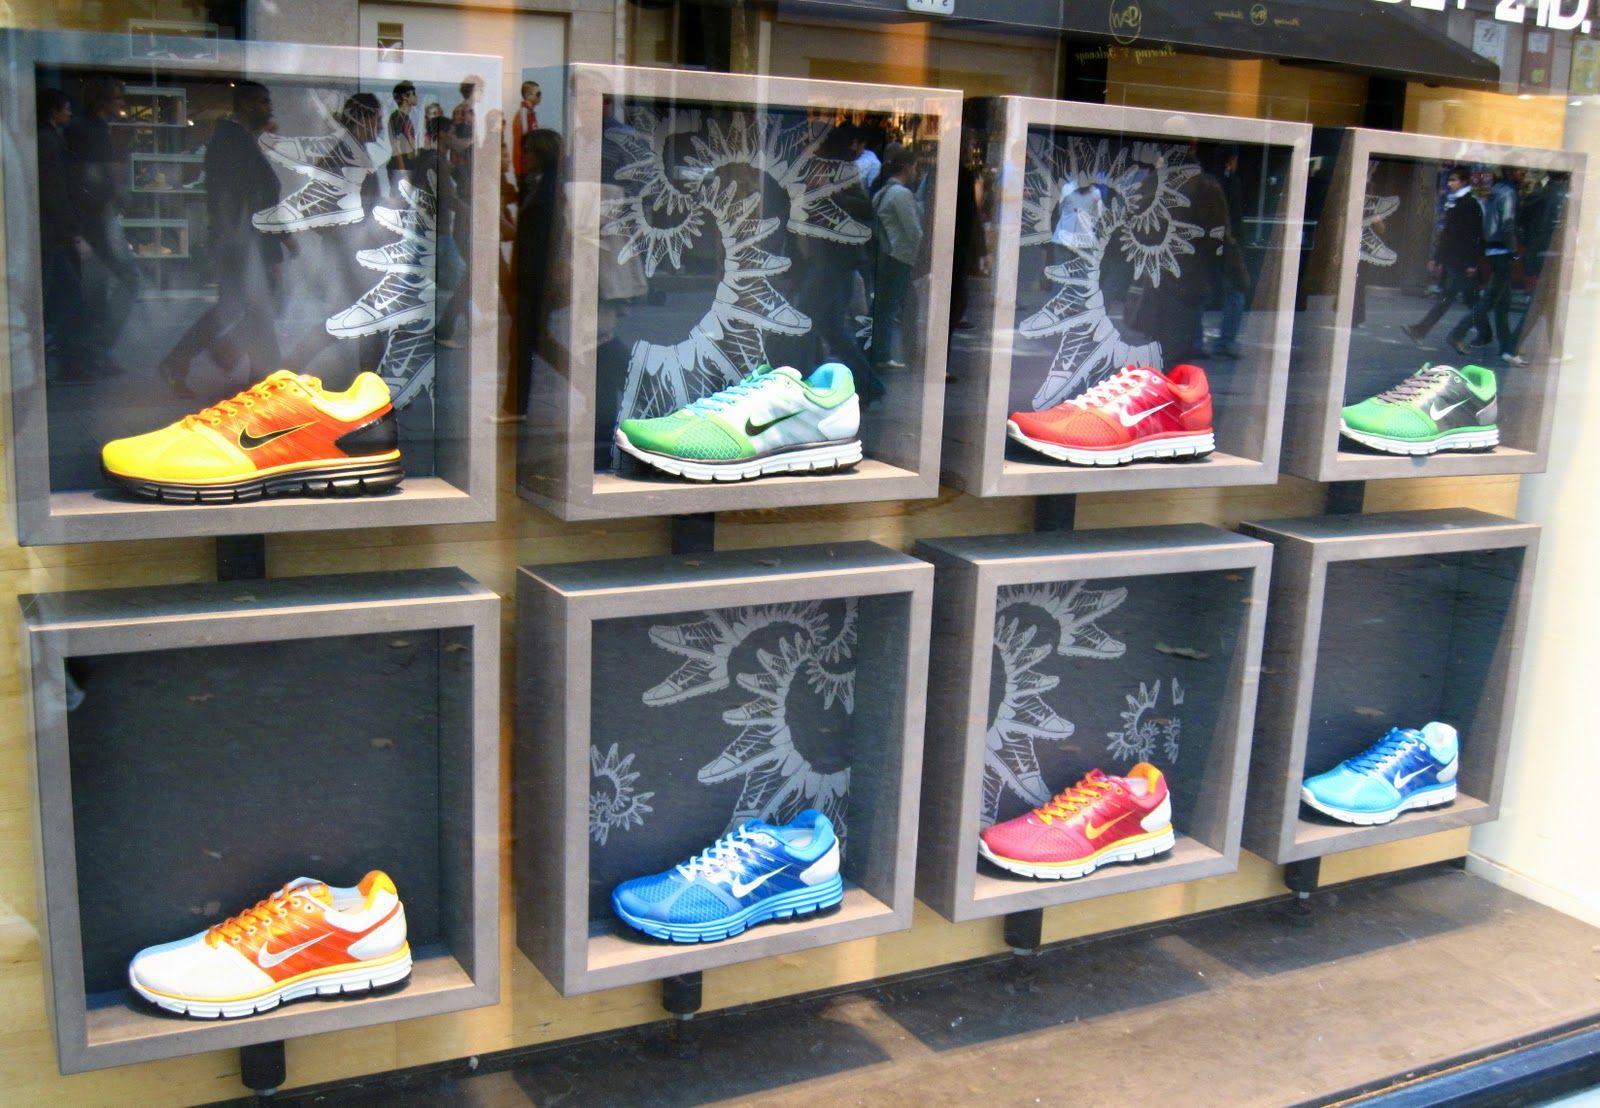 Shoe display, Kids shoe stores, Diy store